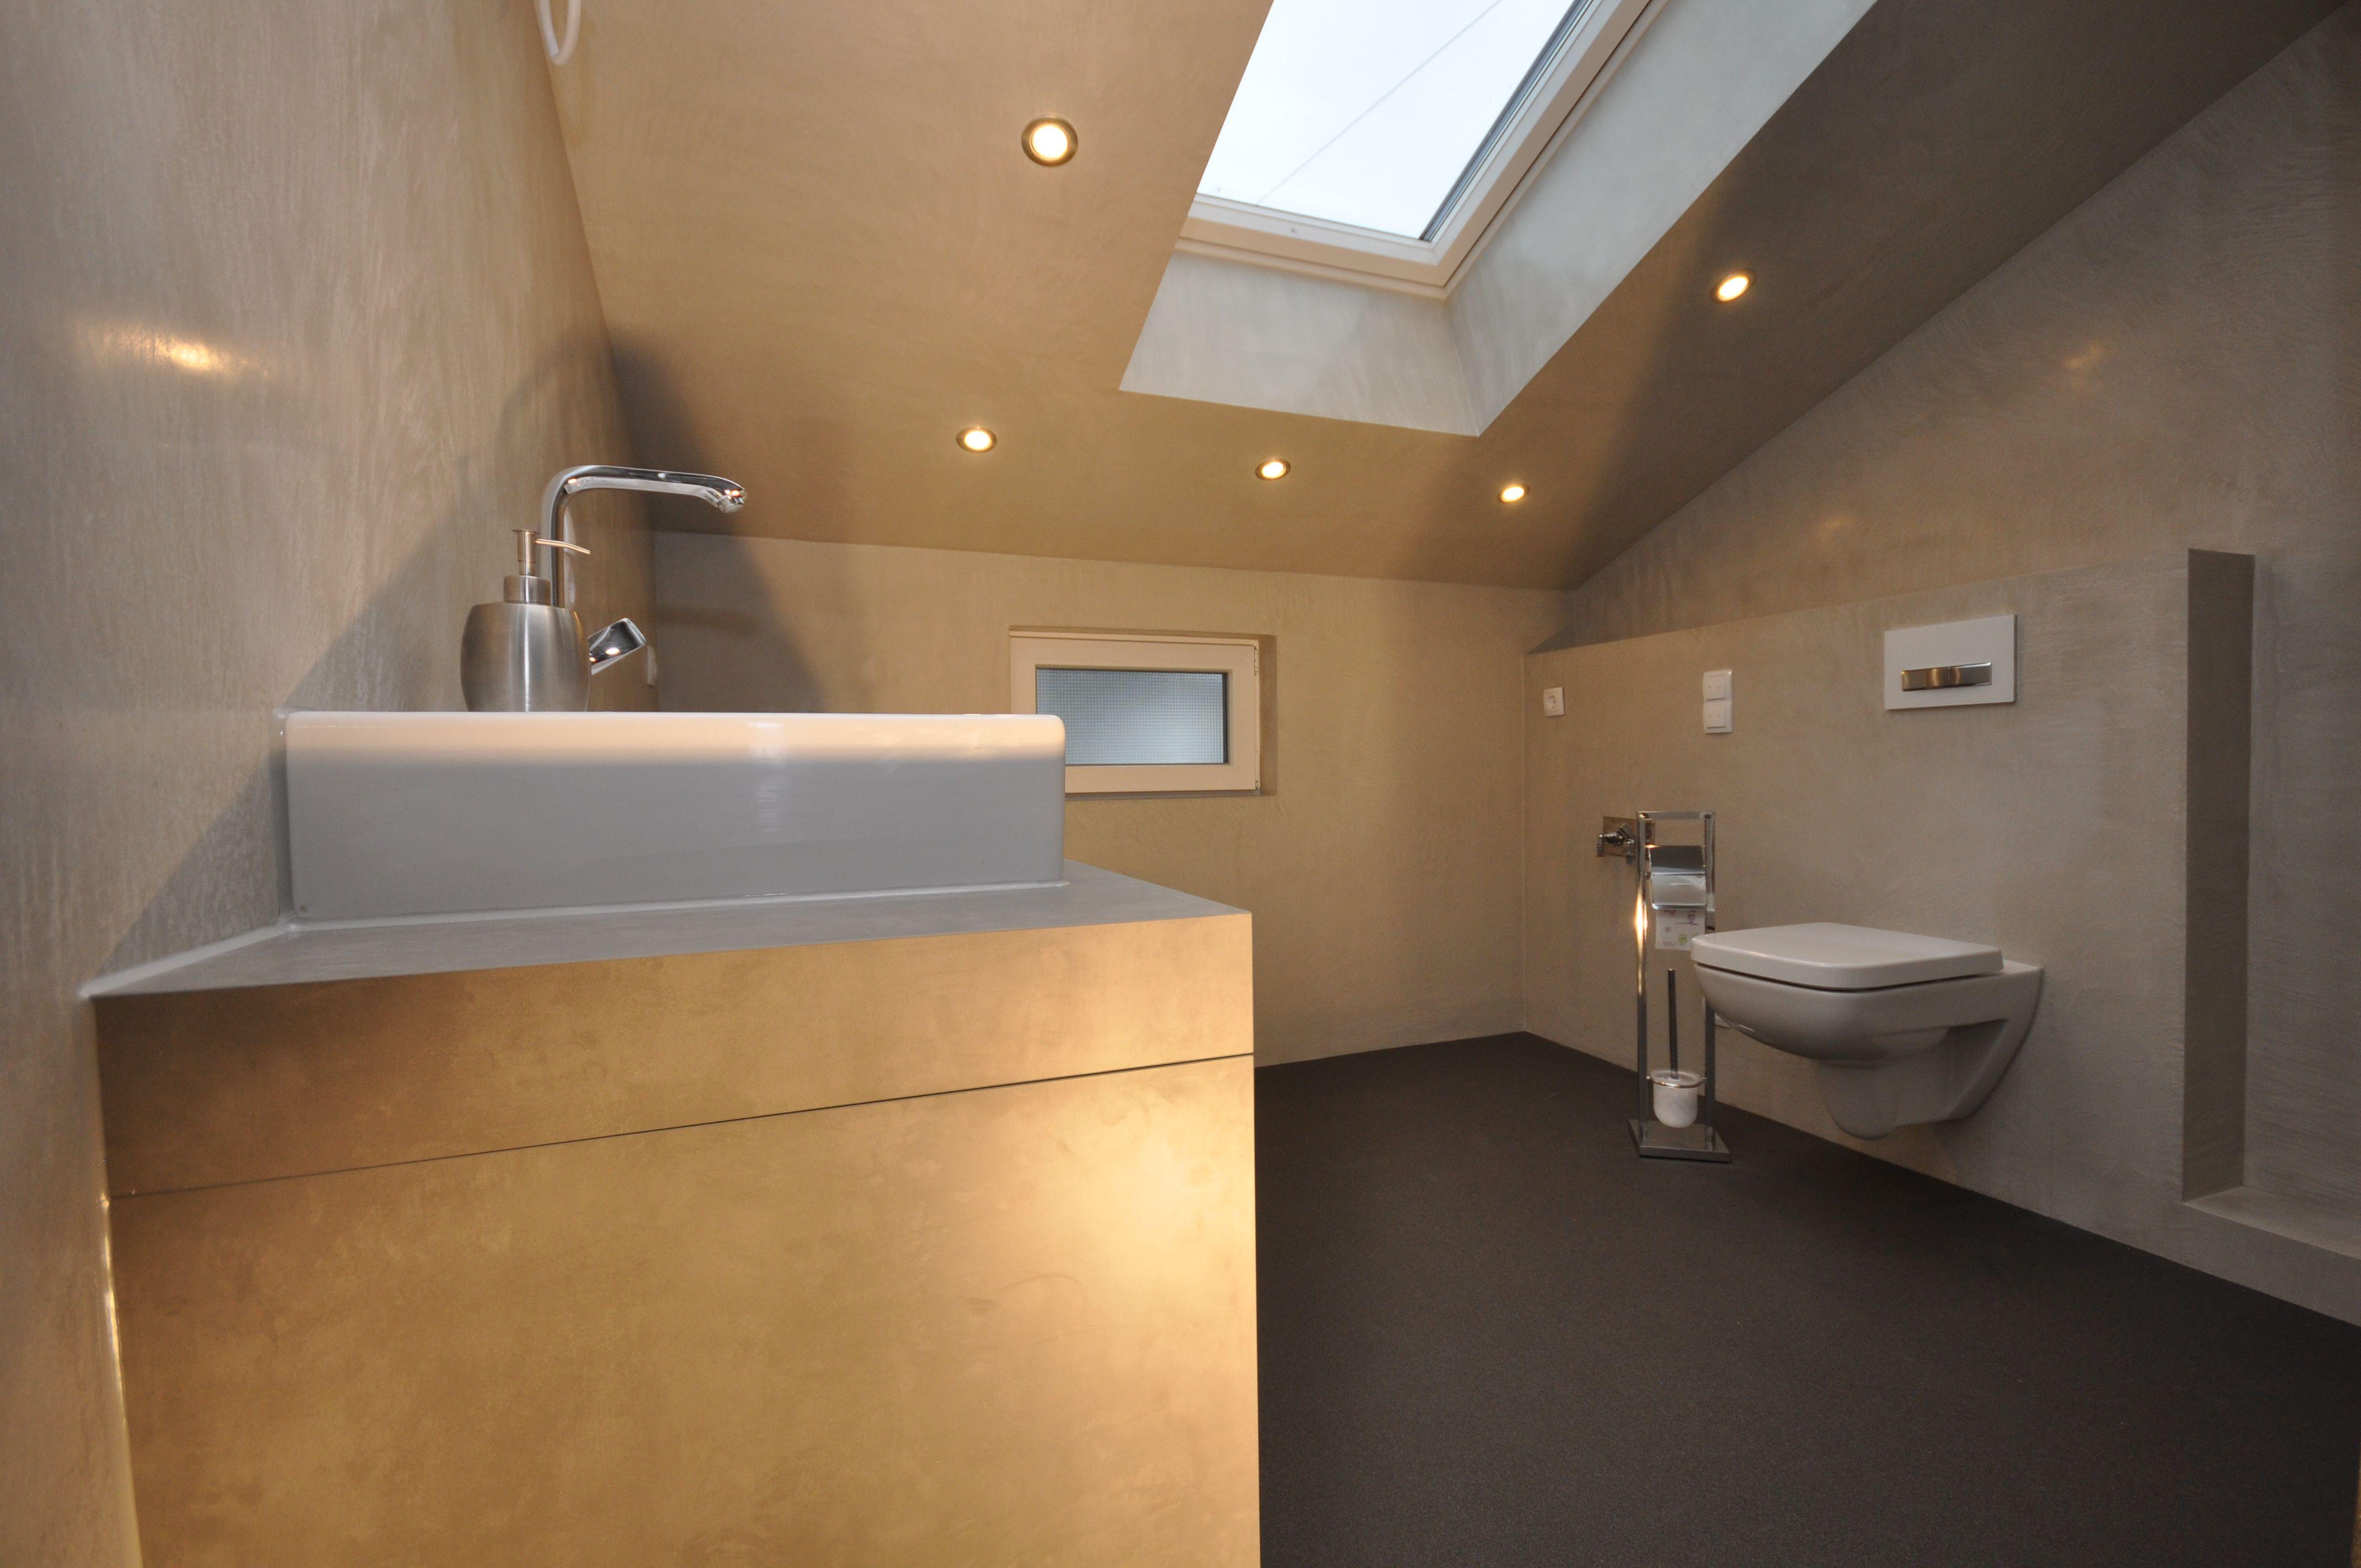 Designbad • Kalk Marmor Putz • fugenlose Wandflächen ...